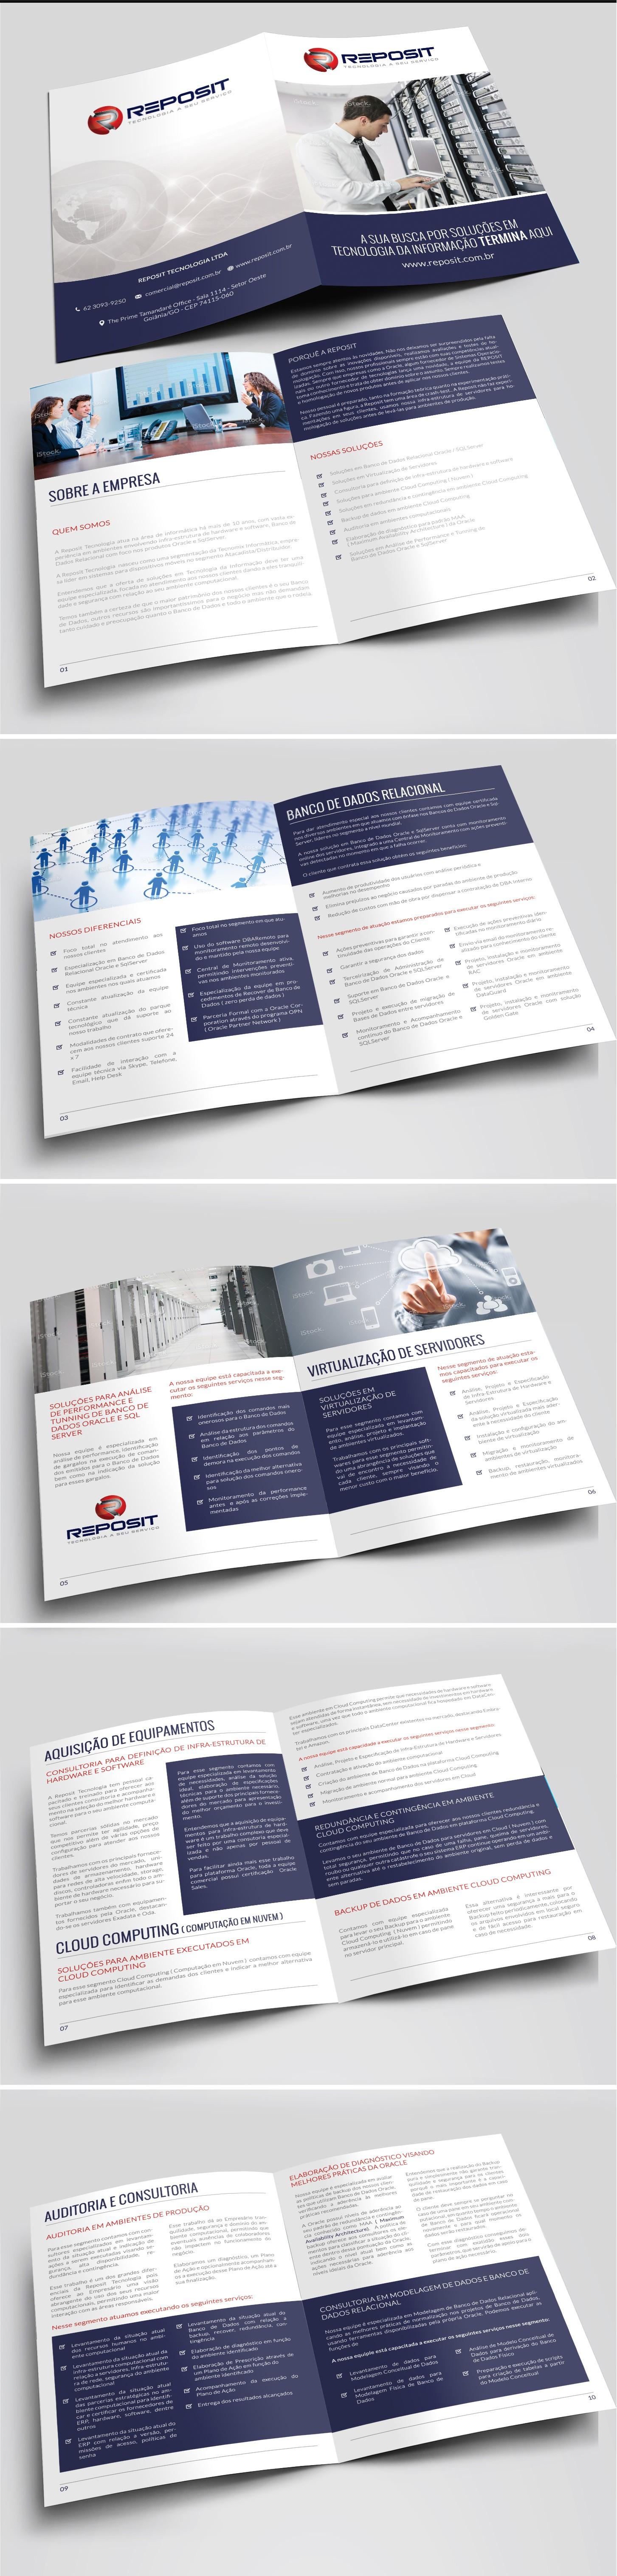 Institutional Brochure For 'Reposit'